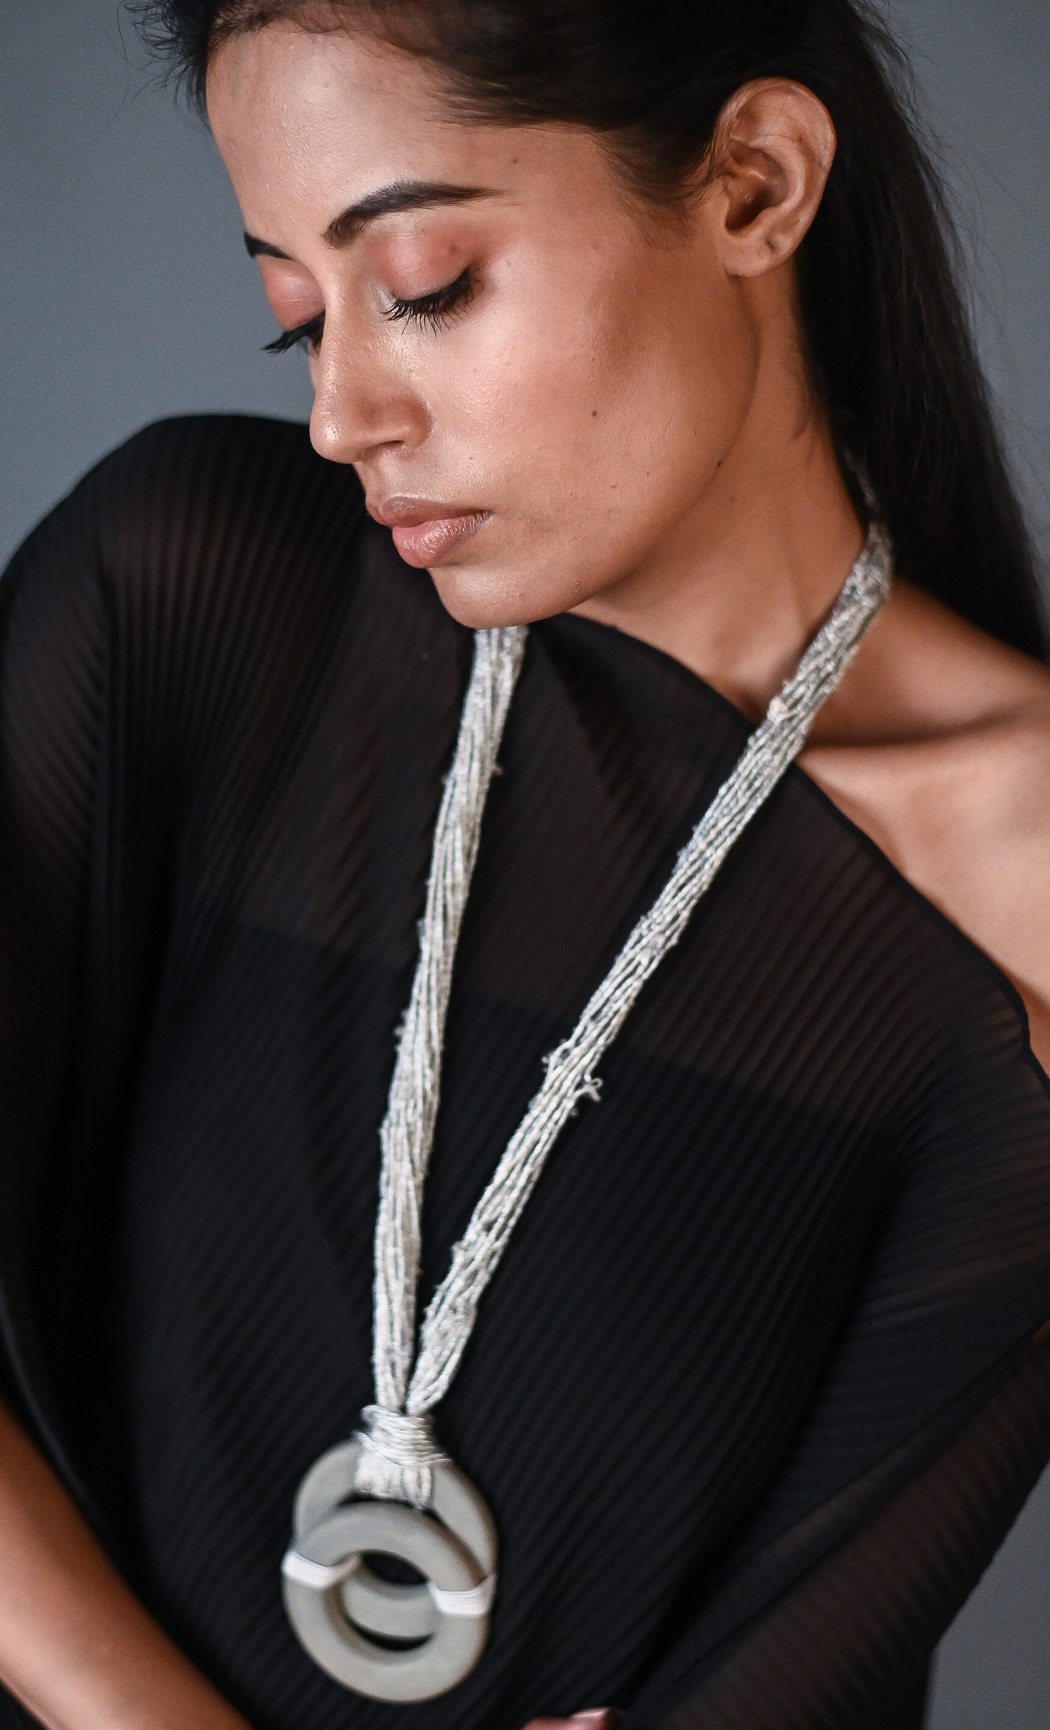 Grey Cori Long Statement Necklace - Buy Online